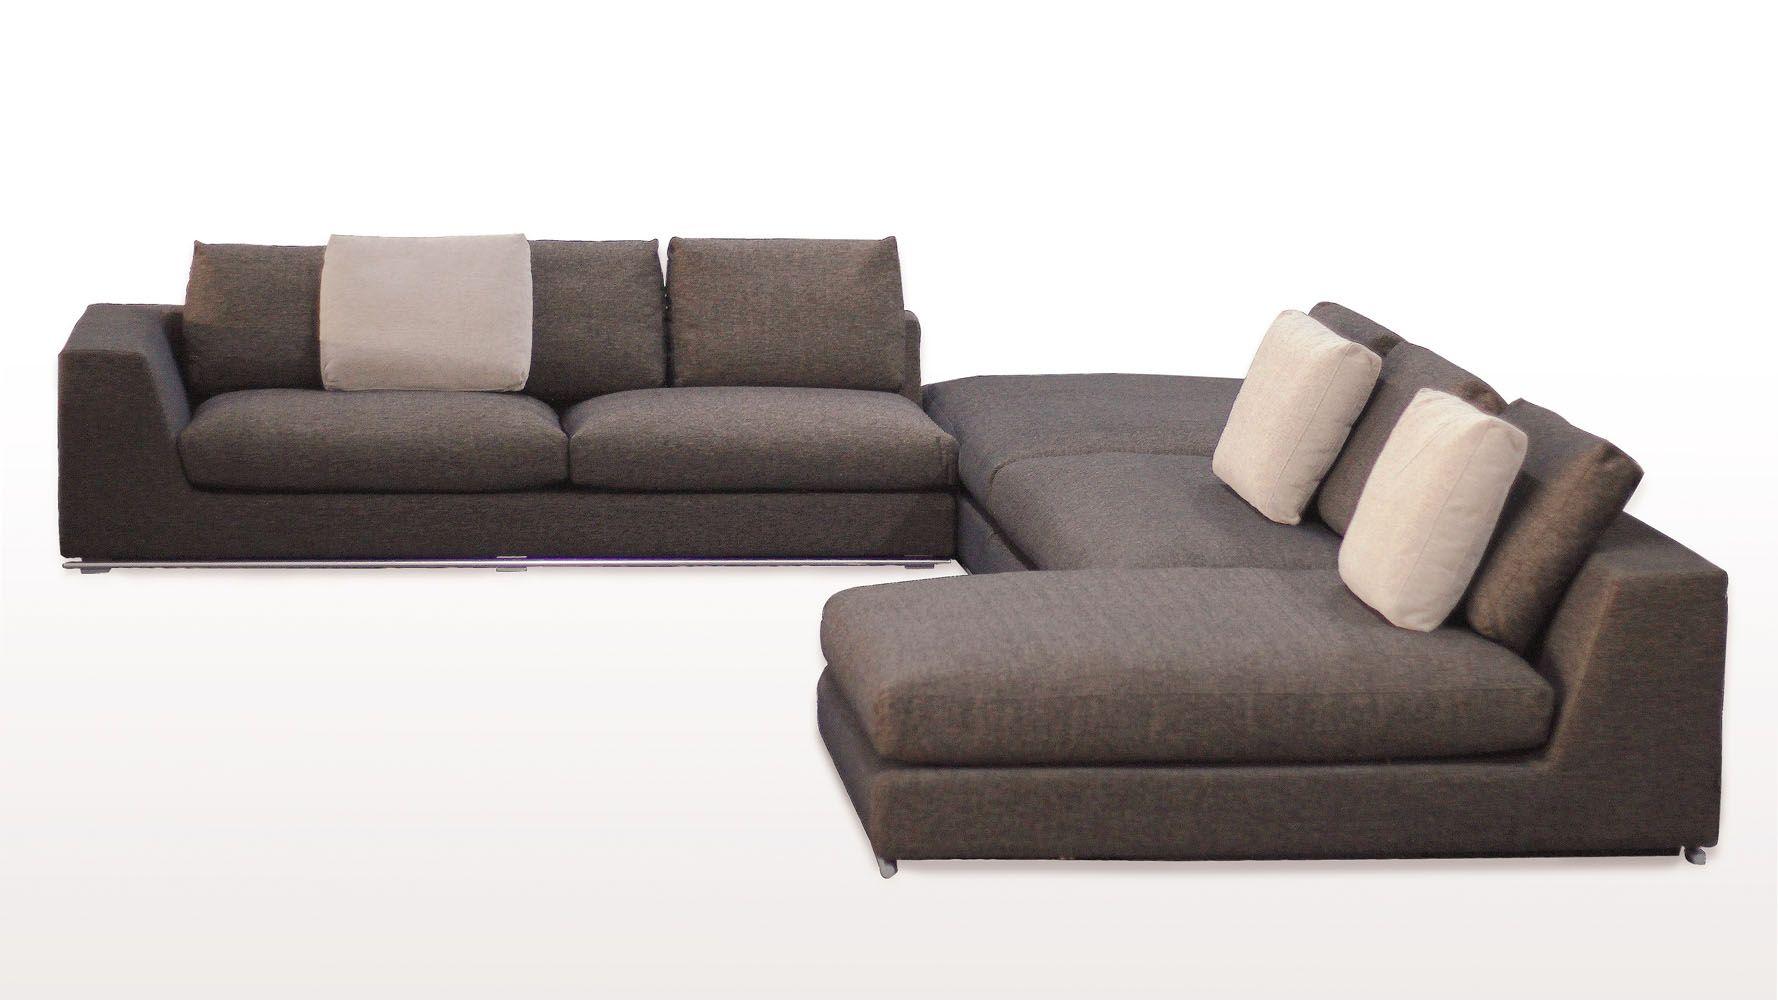 Comodo Sectional Sofa With Ottoman Charcoal Zuri Furniture